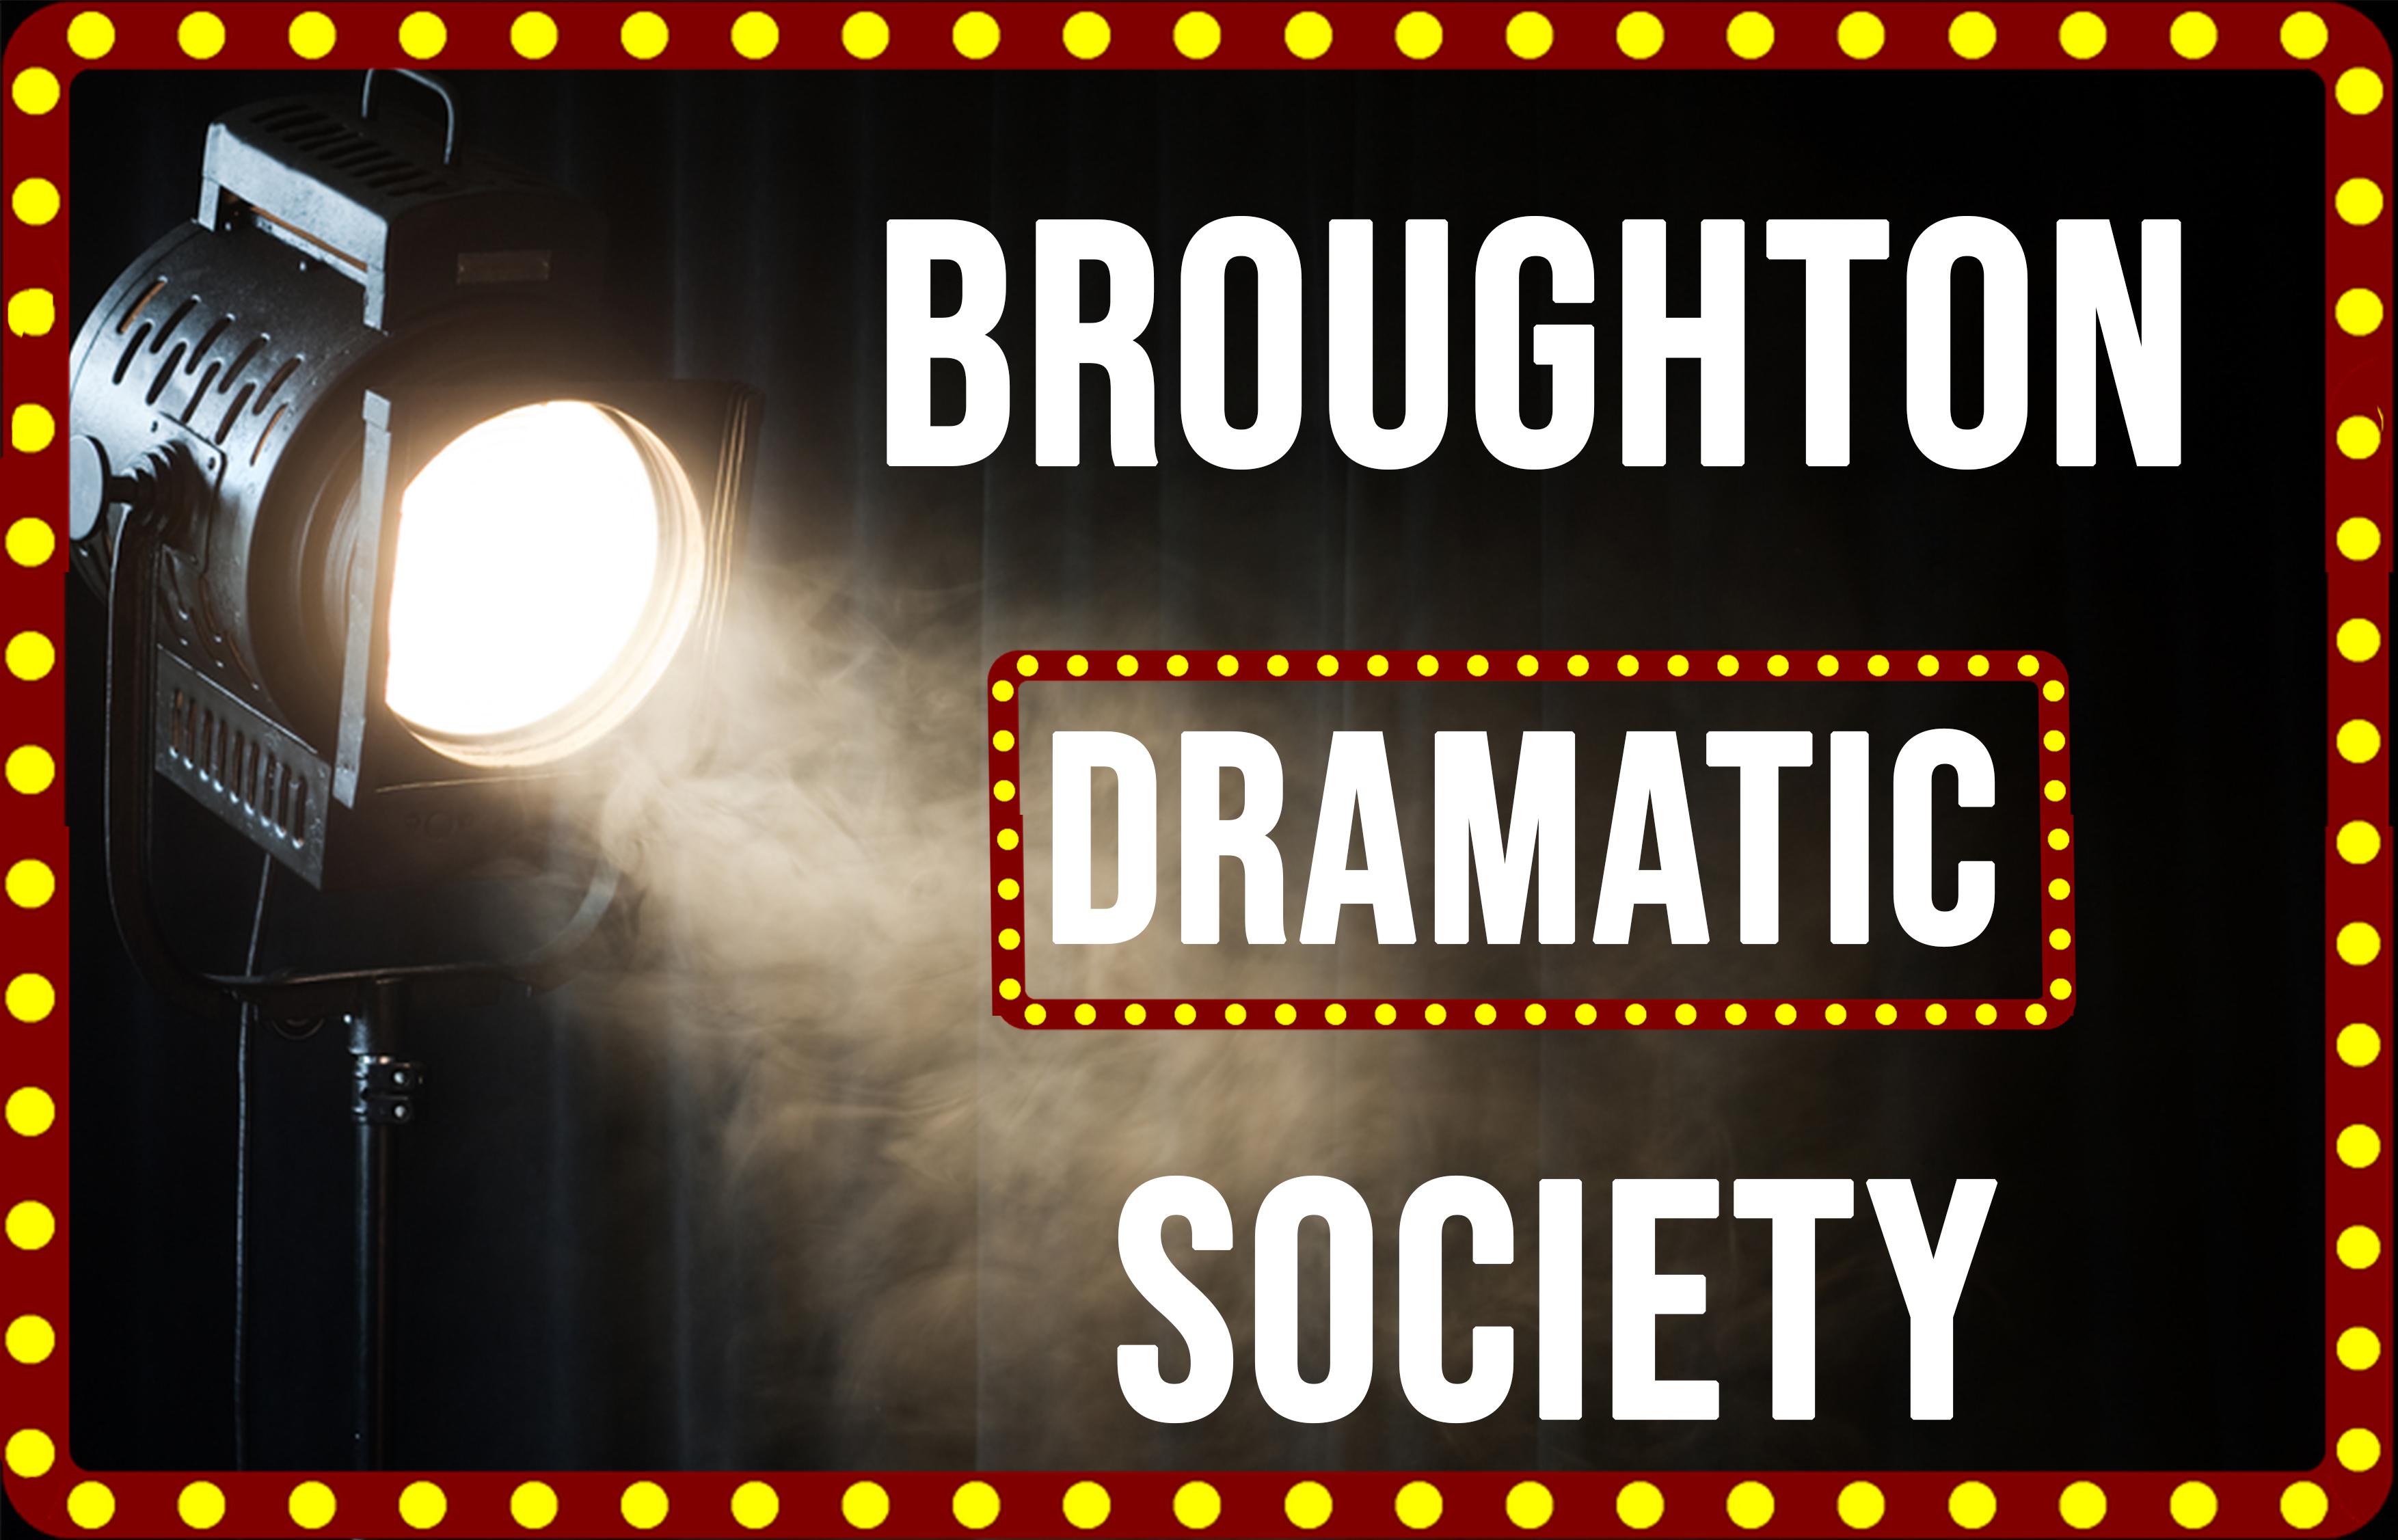 Broughton Dramatic Society -